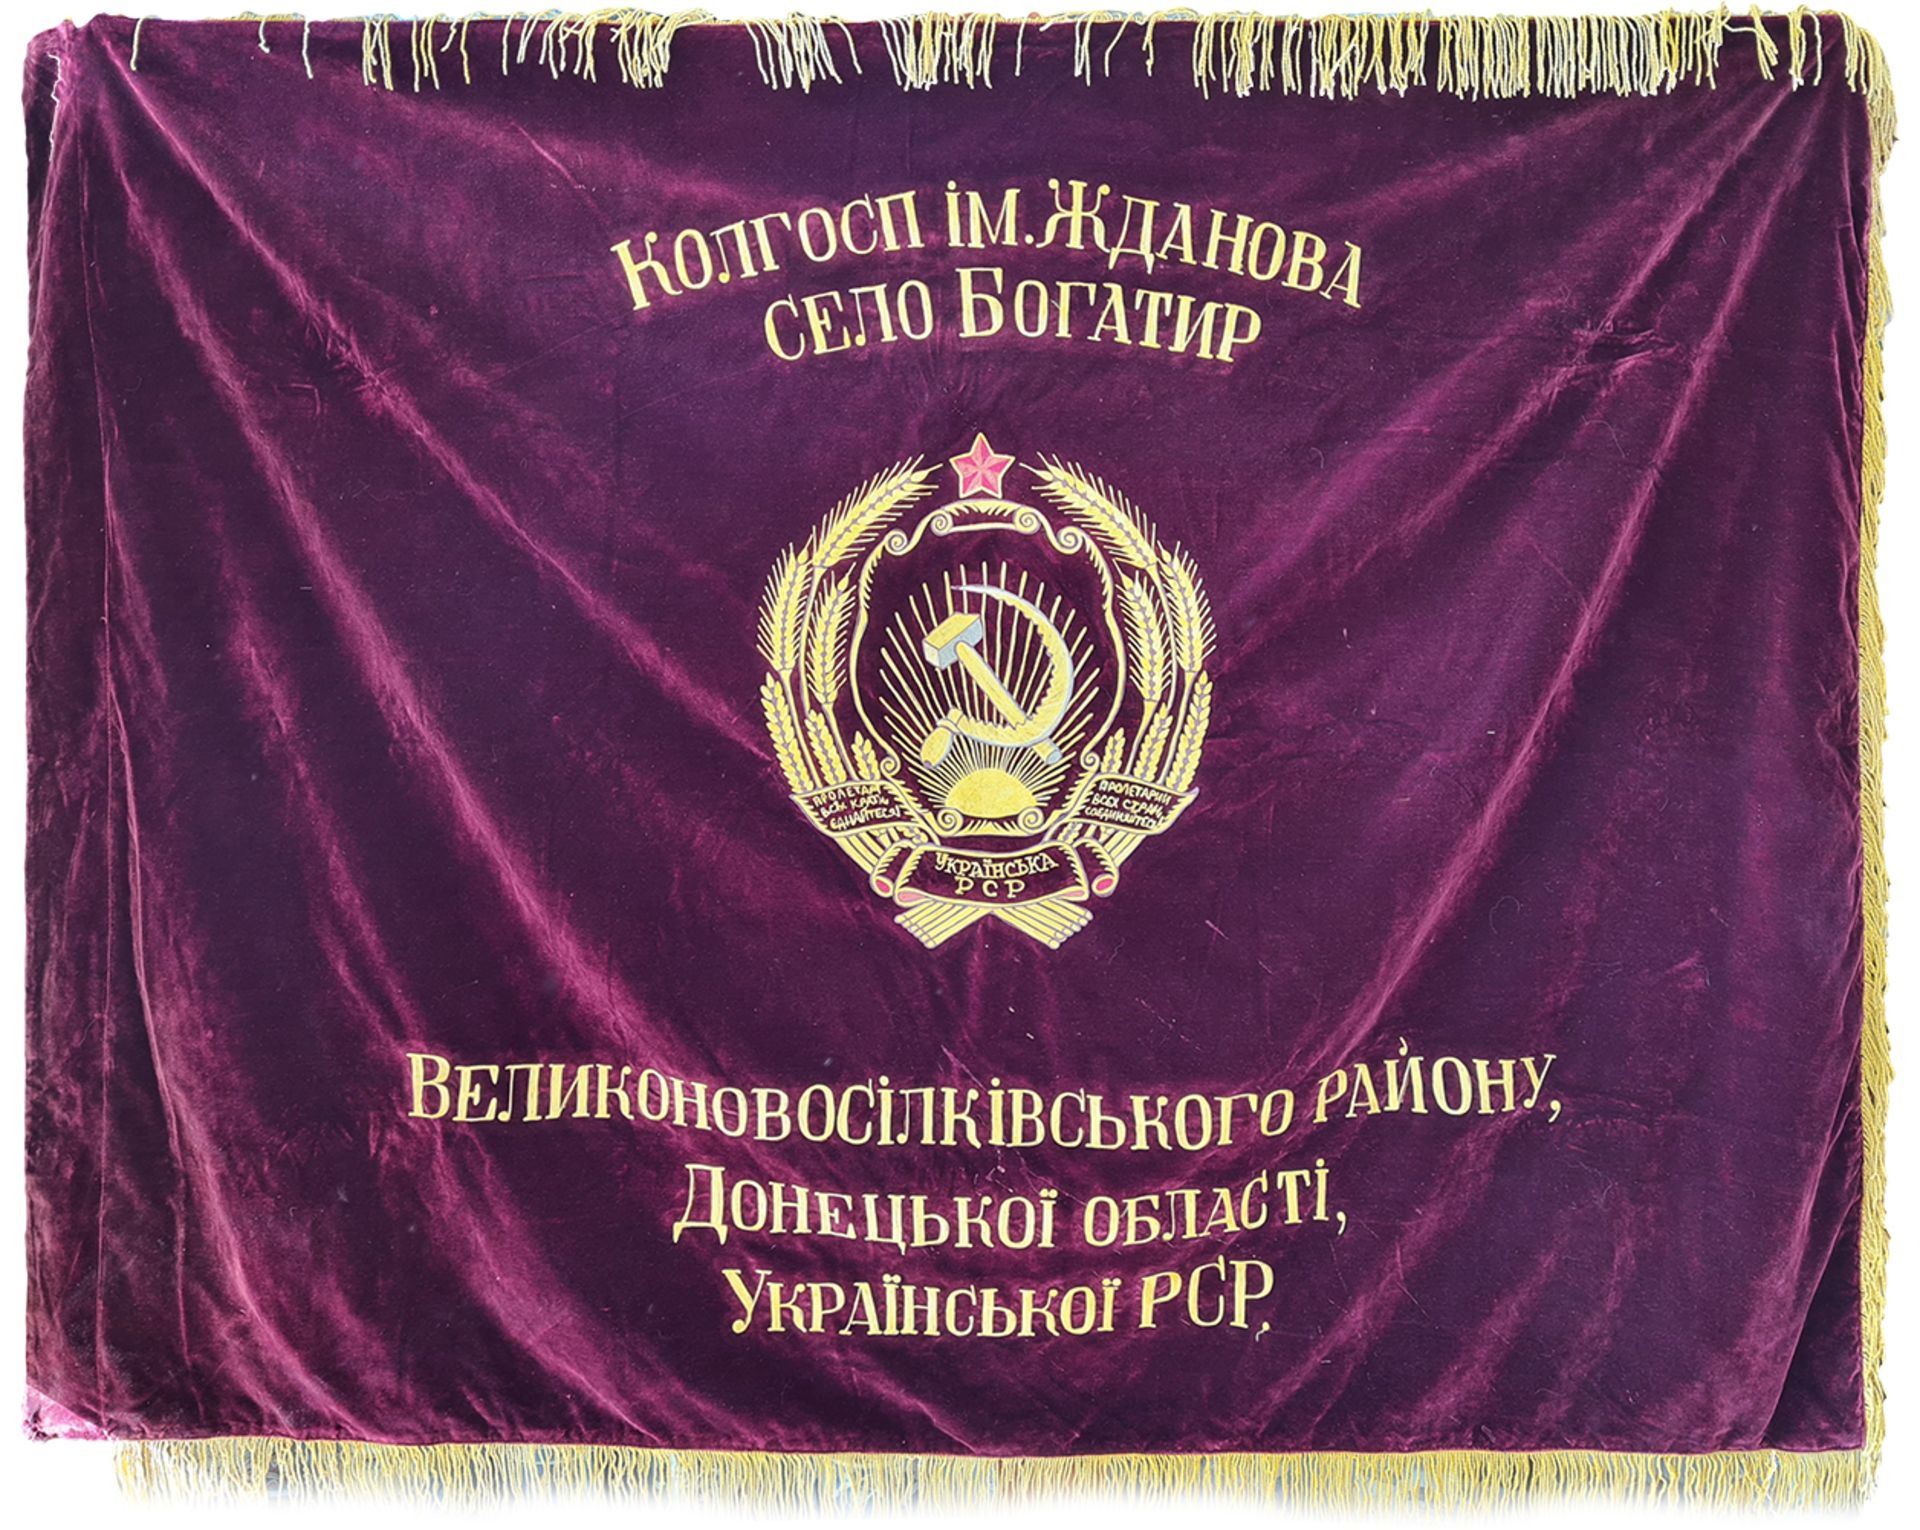 Soviet Union, Ukraine, Donezk, KOLHOZ-- is school of communism for farmers, double-sided,